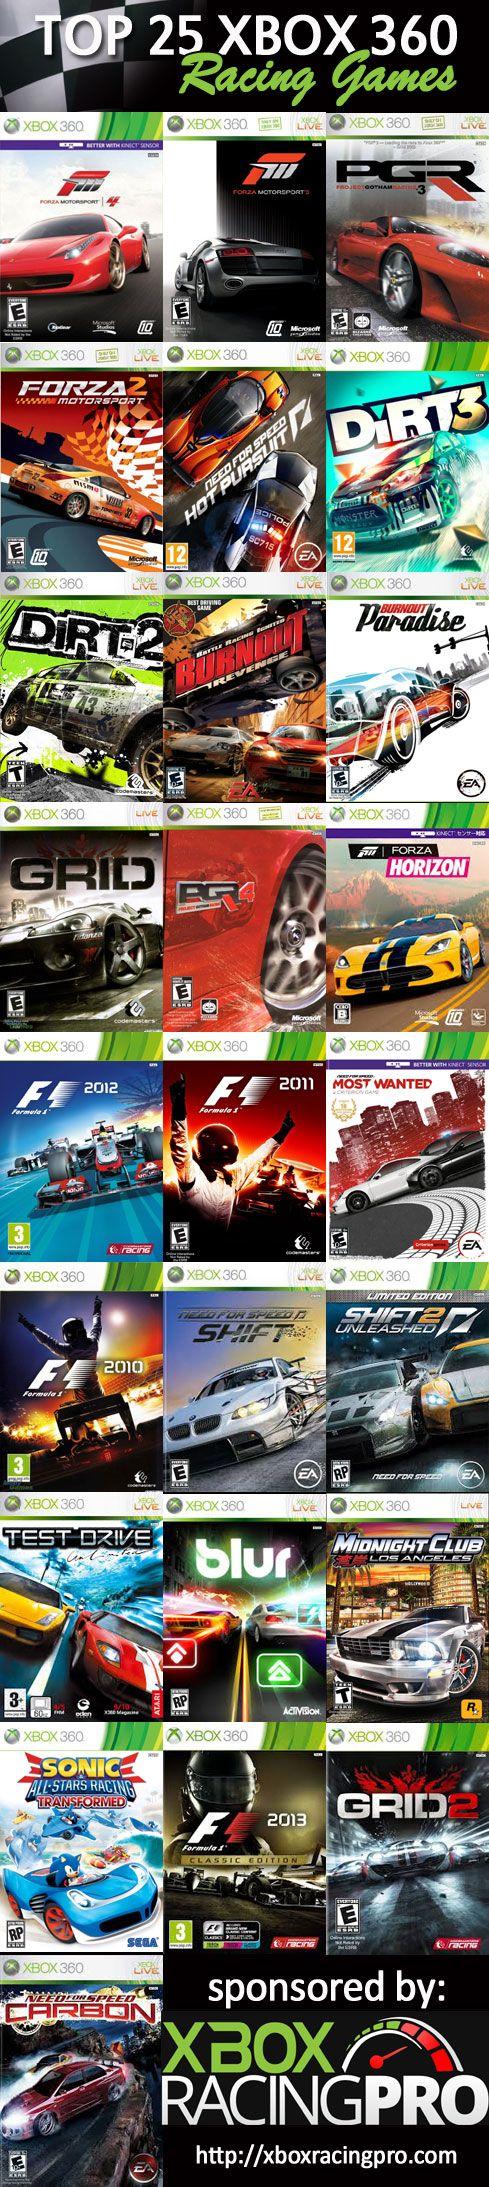 Free download csr racing game apps for laptop pc desktop windows 7 8 10 mac os x apps store for laptop desktop and pc pinterest mac os